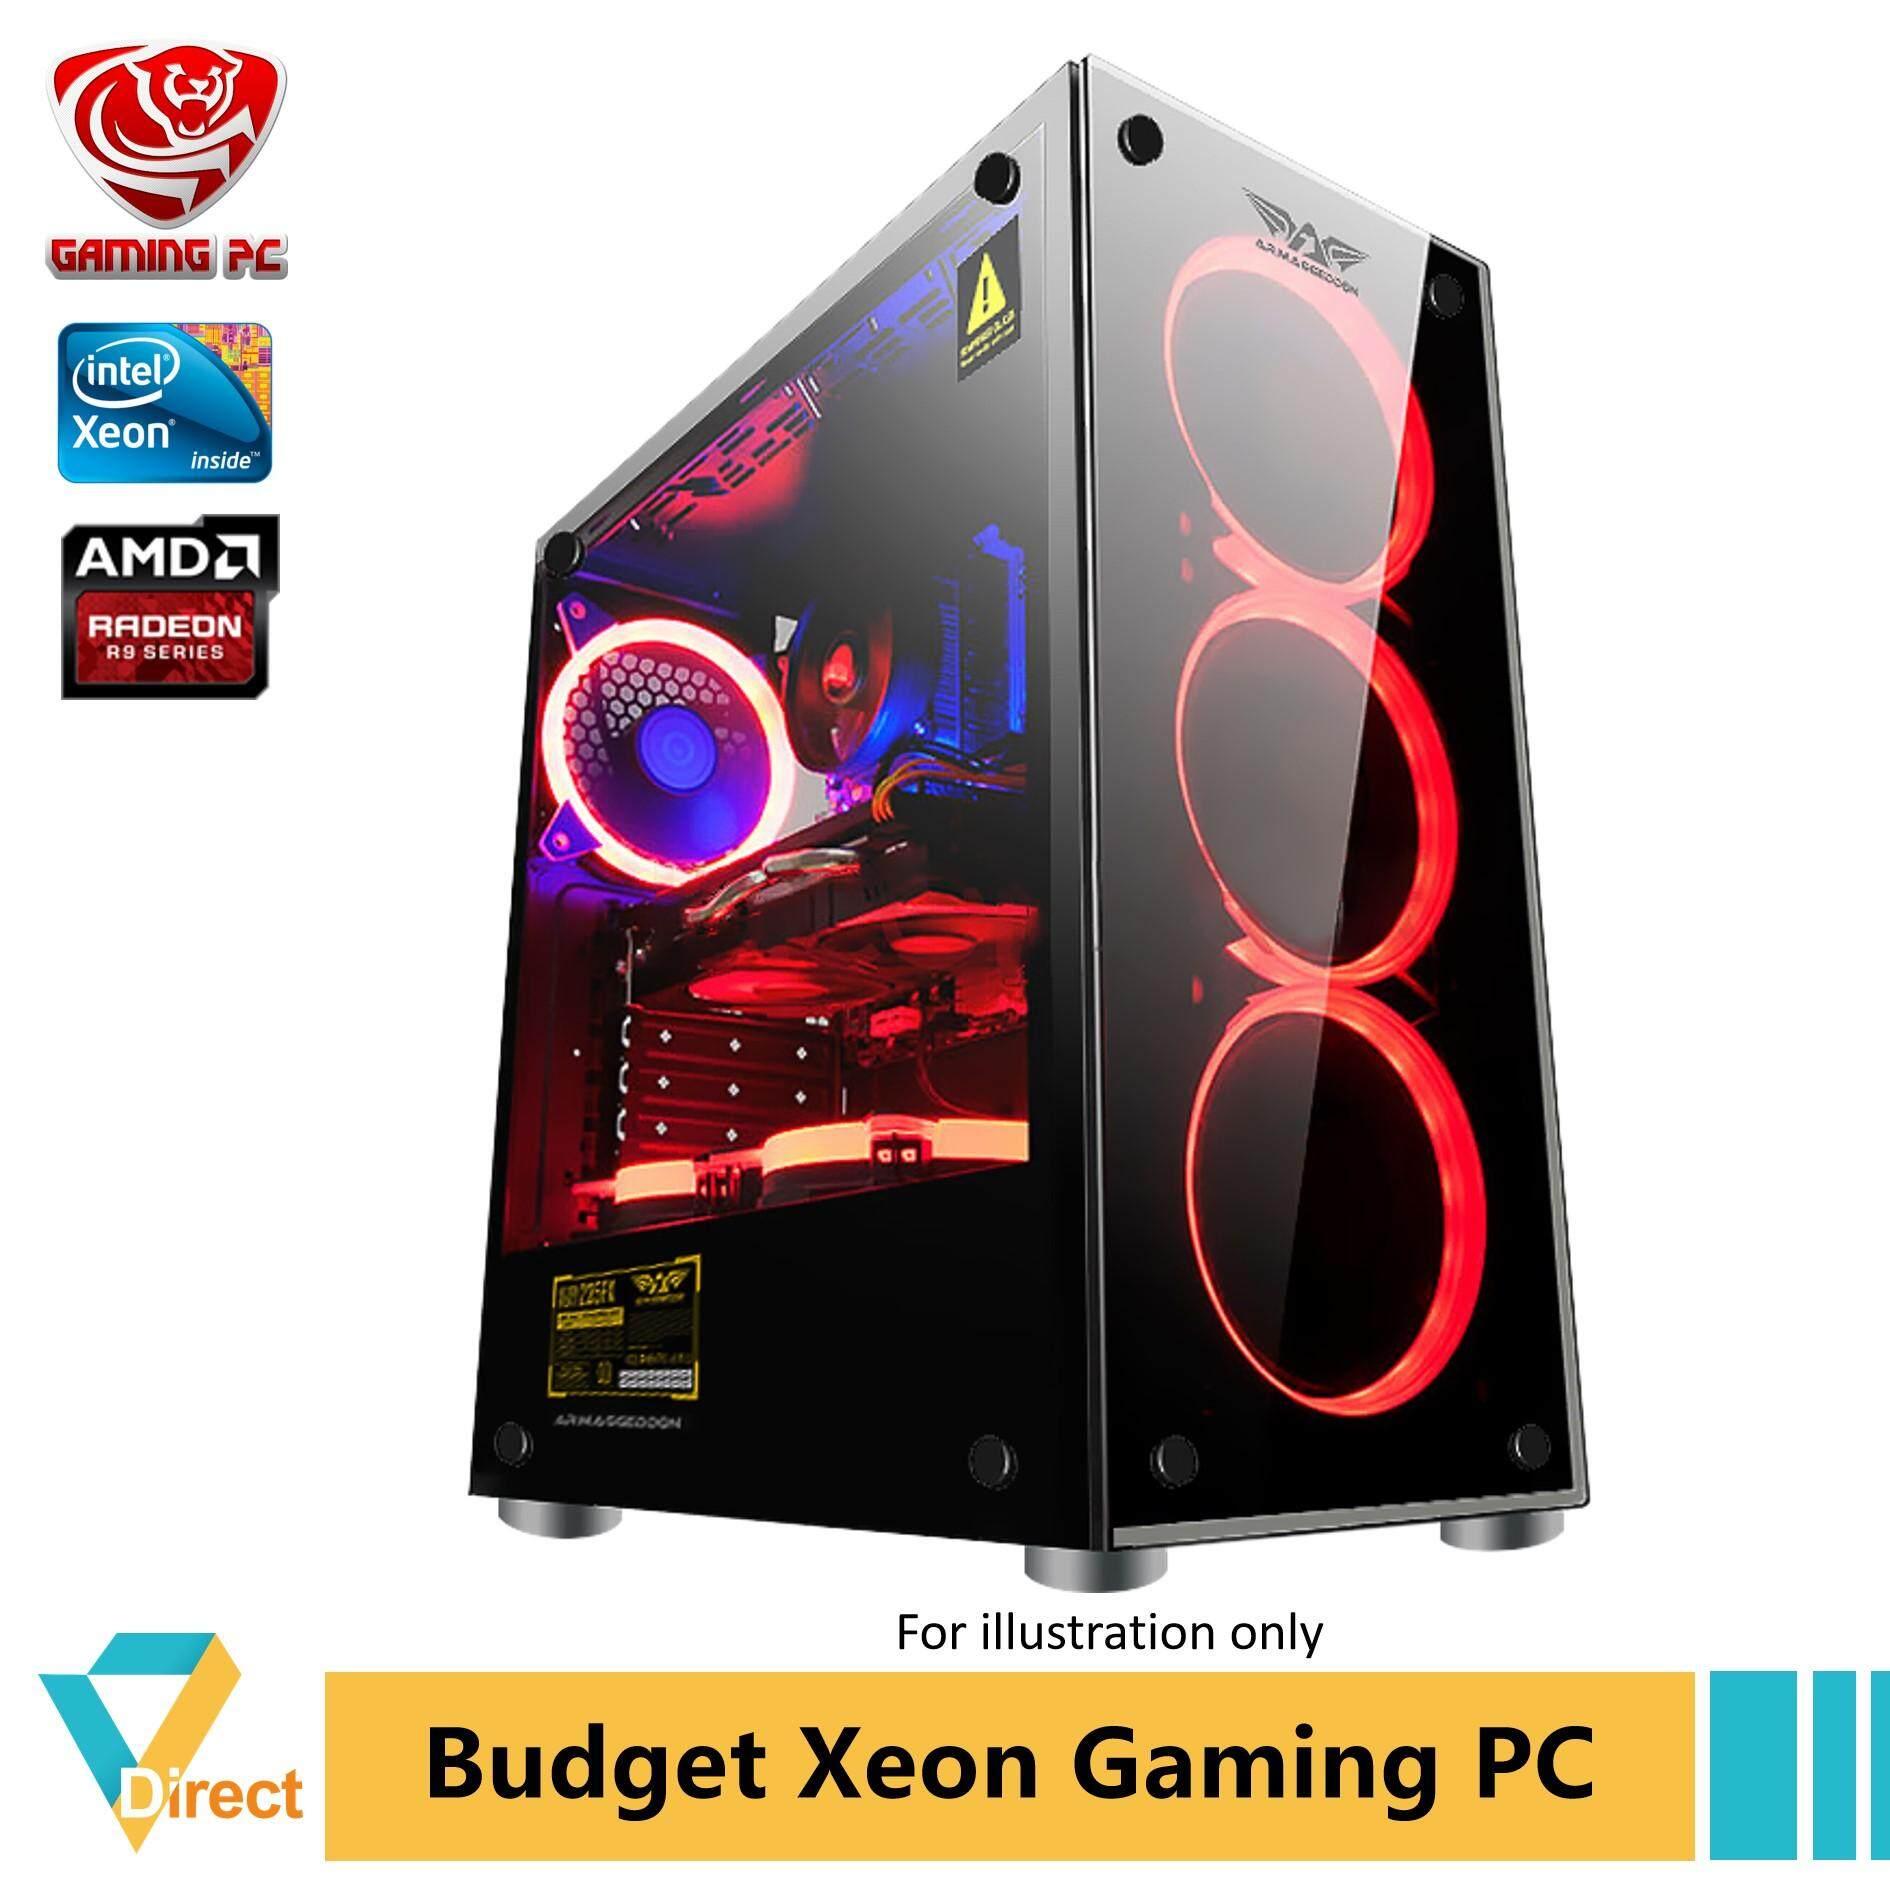 Budget Xeon gaming PC 16GB RAM 480GB SSD AMD R9 370 for PUBG LOL GTA vdgpc